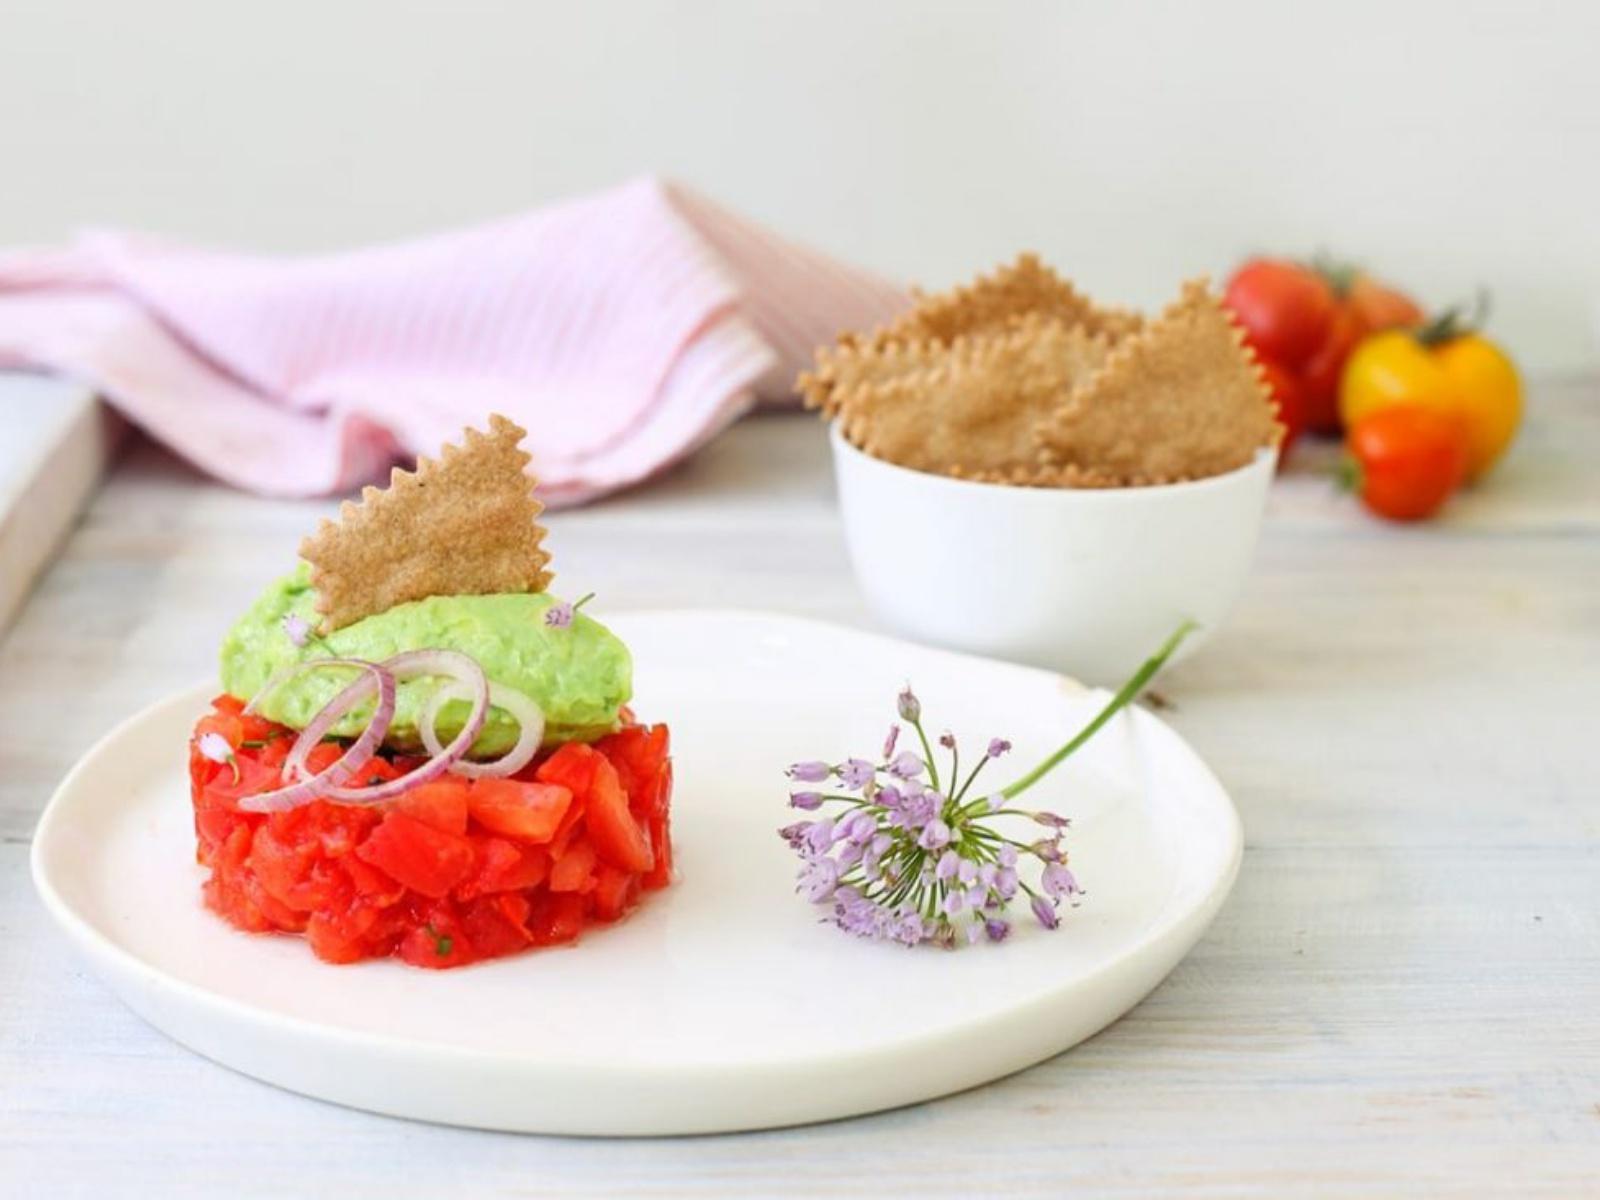 Tomato Tartare with Avocado Cream and Amaranth Leaves